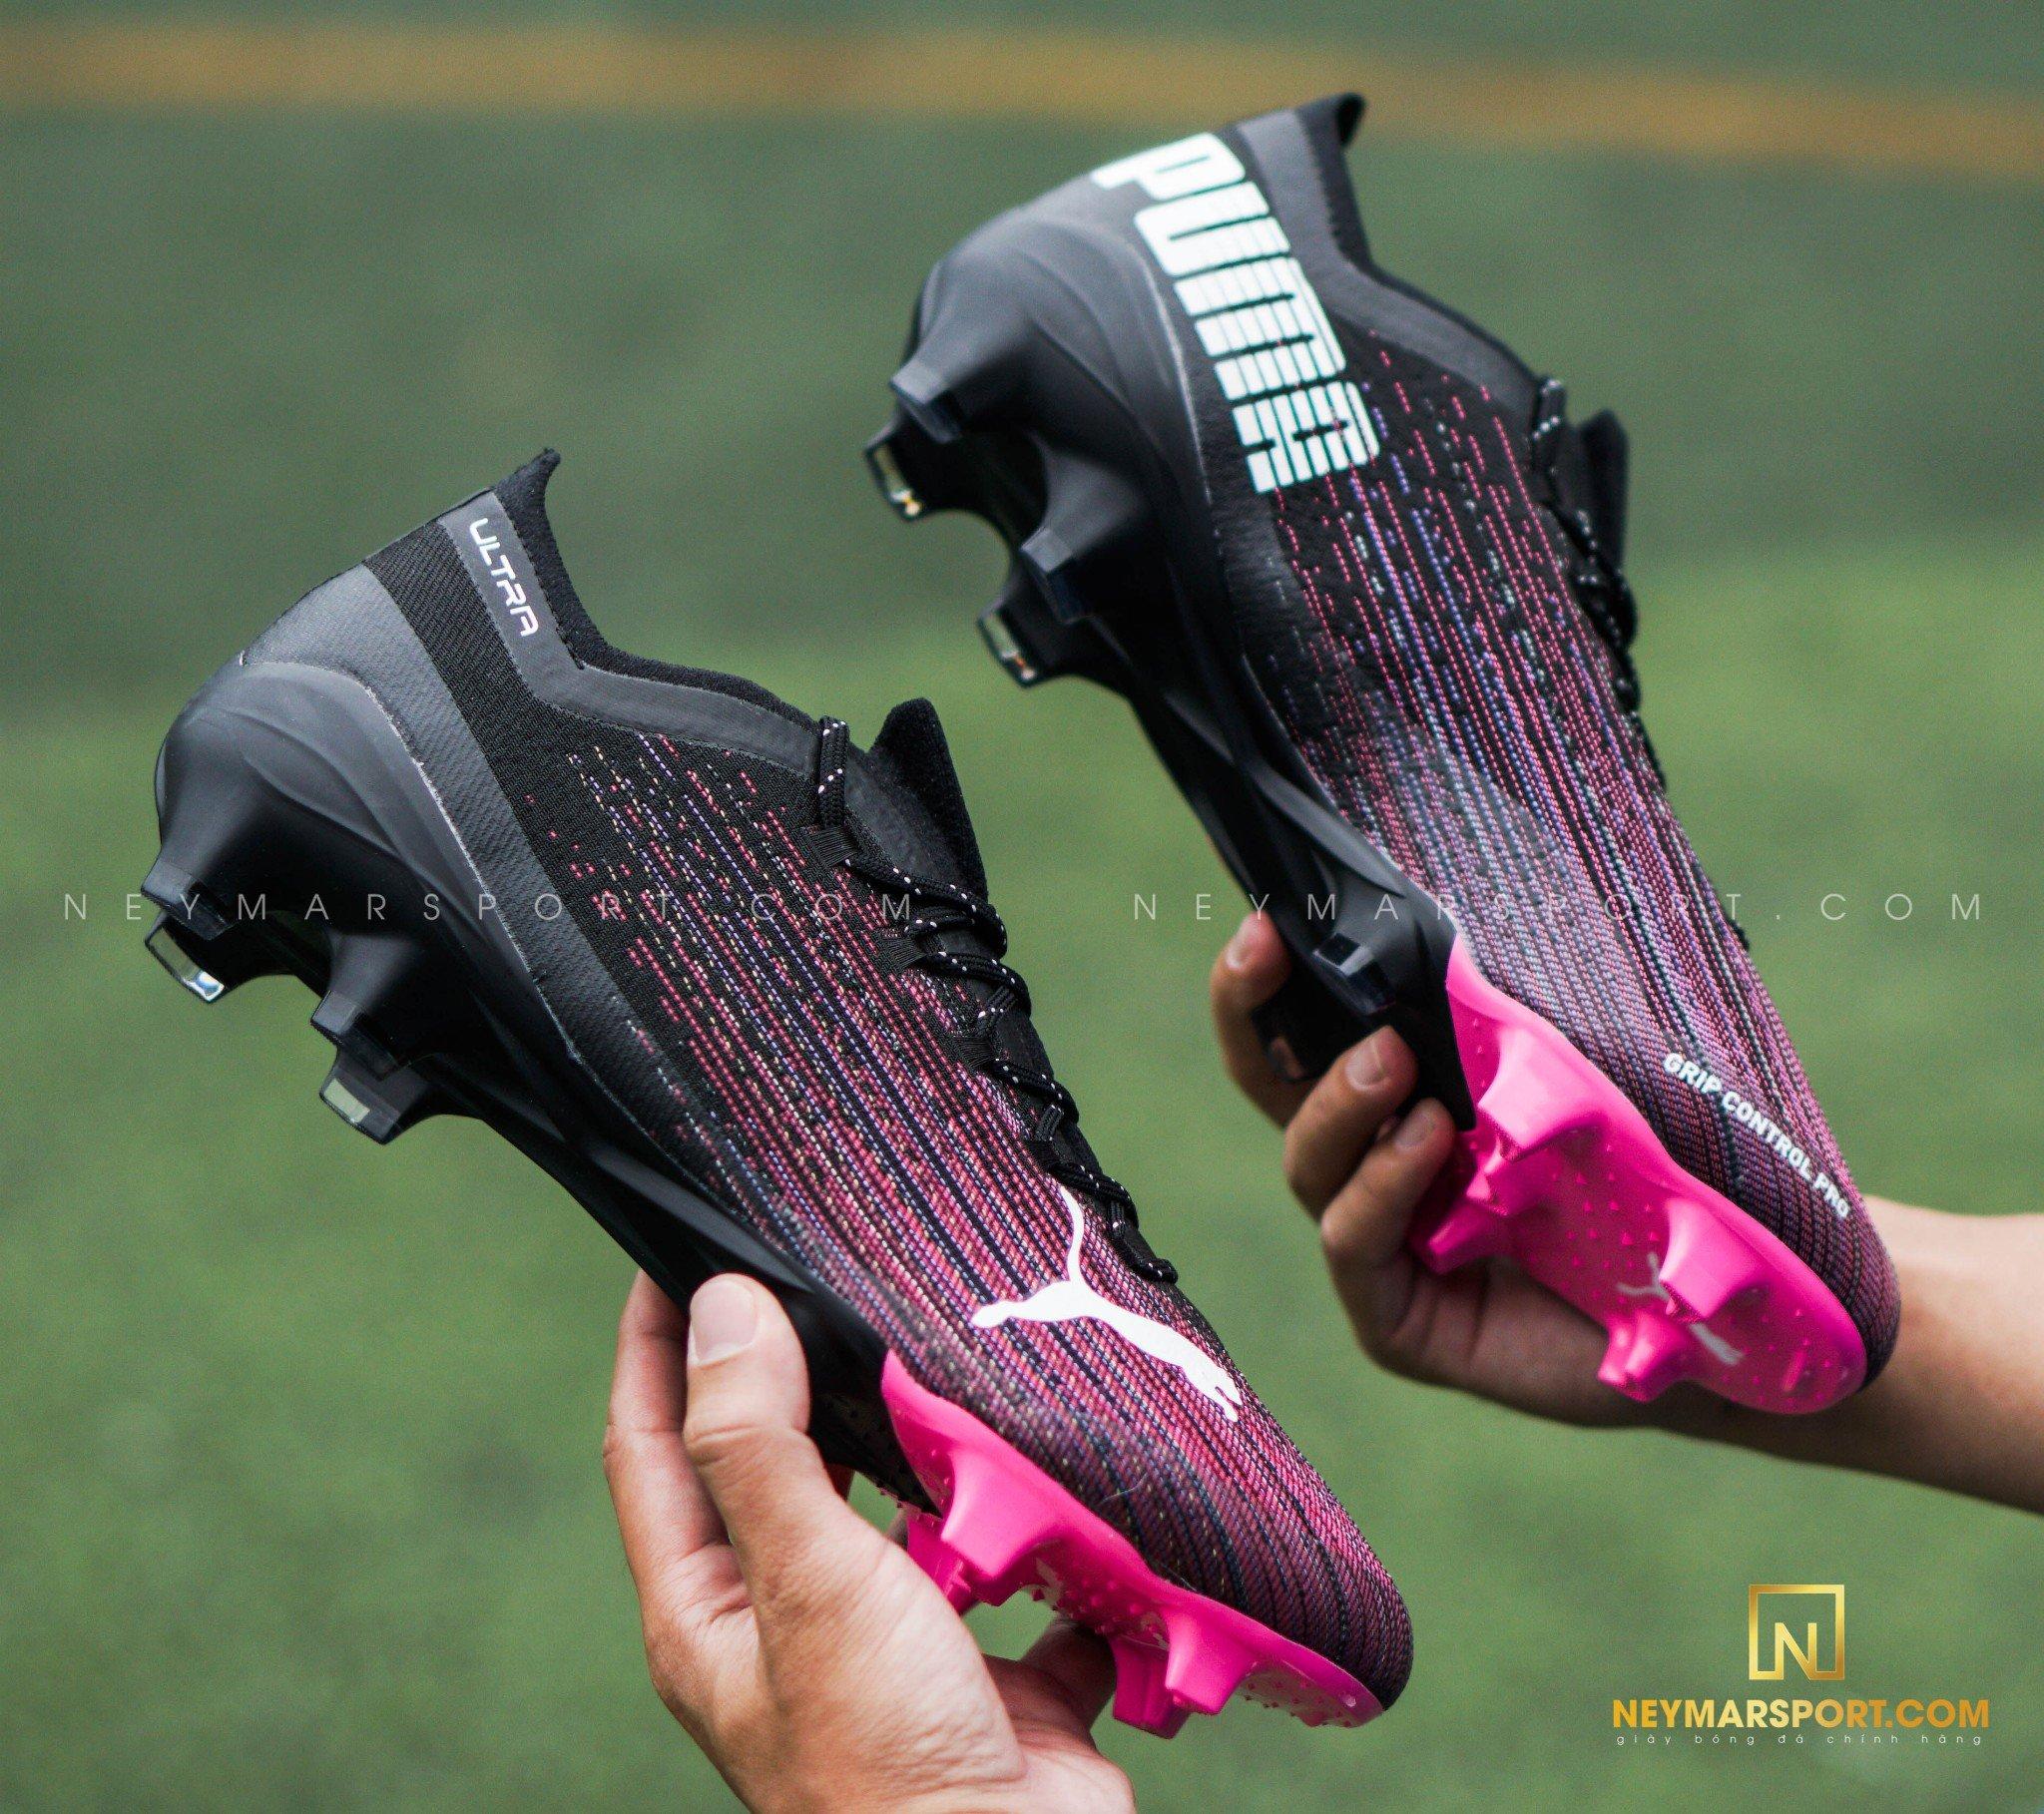 Giày đá bóng Puma Ultra 1.1 FG/AG Turbo